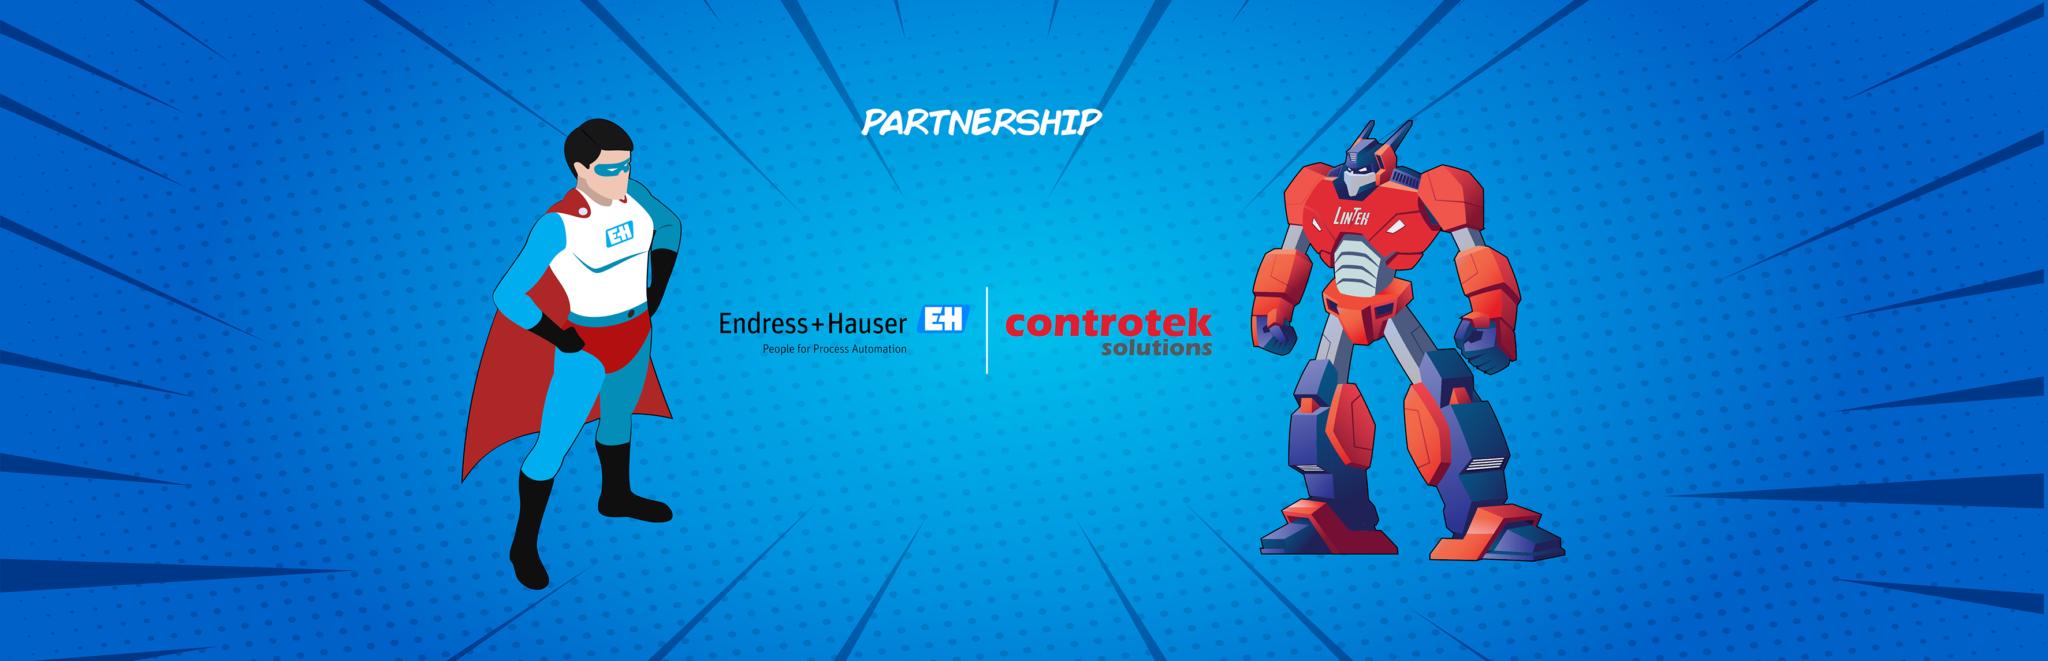 Endress+Hauser_Controtek_Partnership